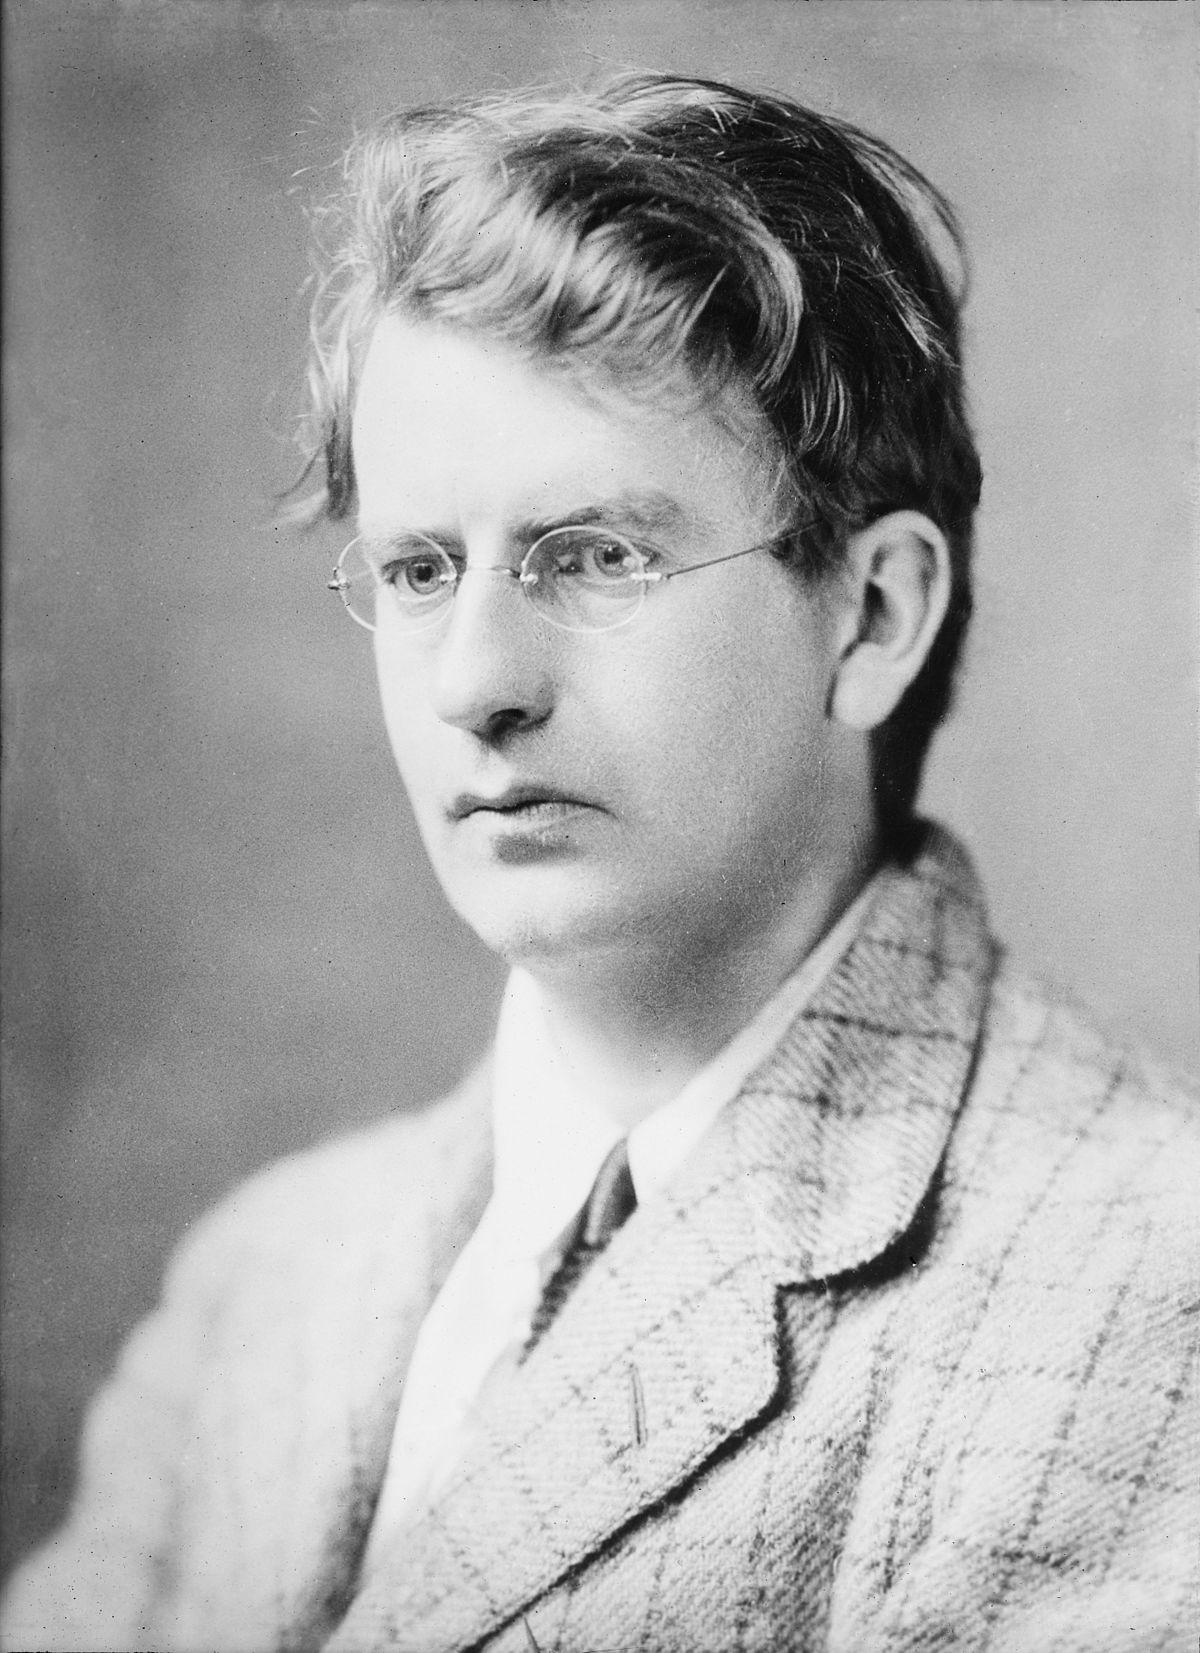 1924-John Logie Baird